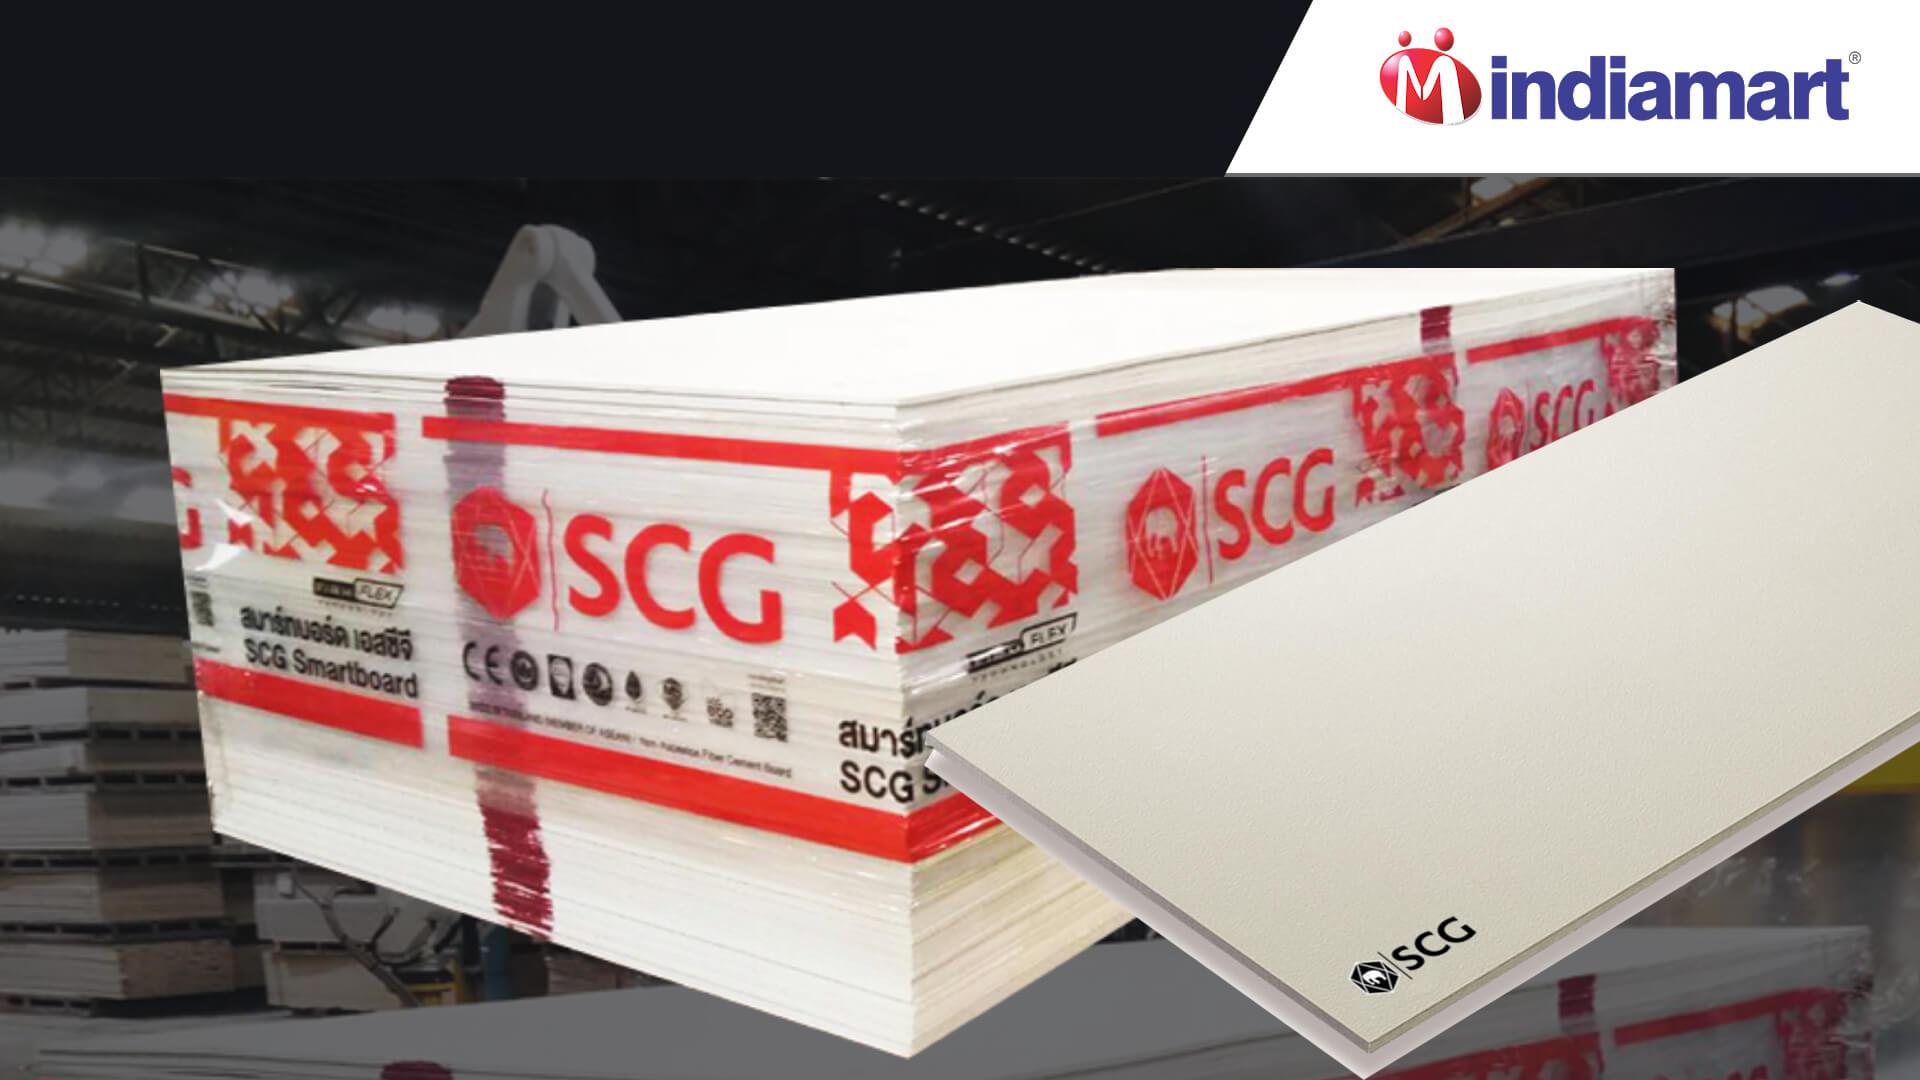 SCG Fiber Cement sheet Price in Indiamart